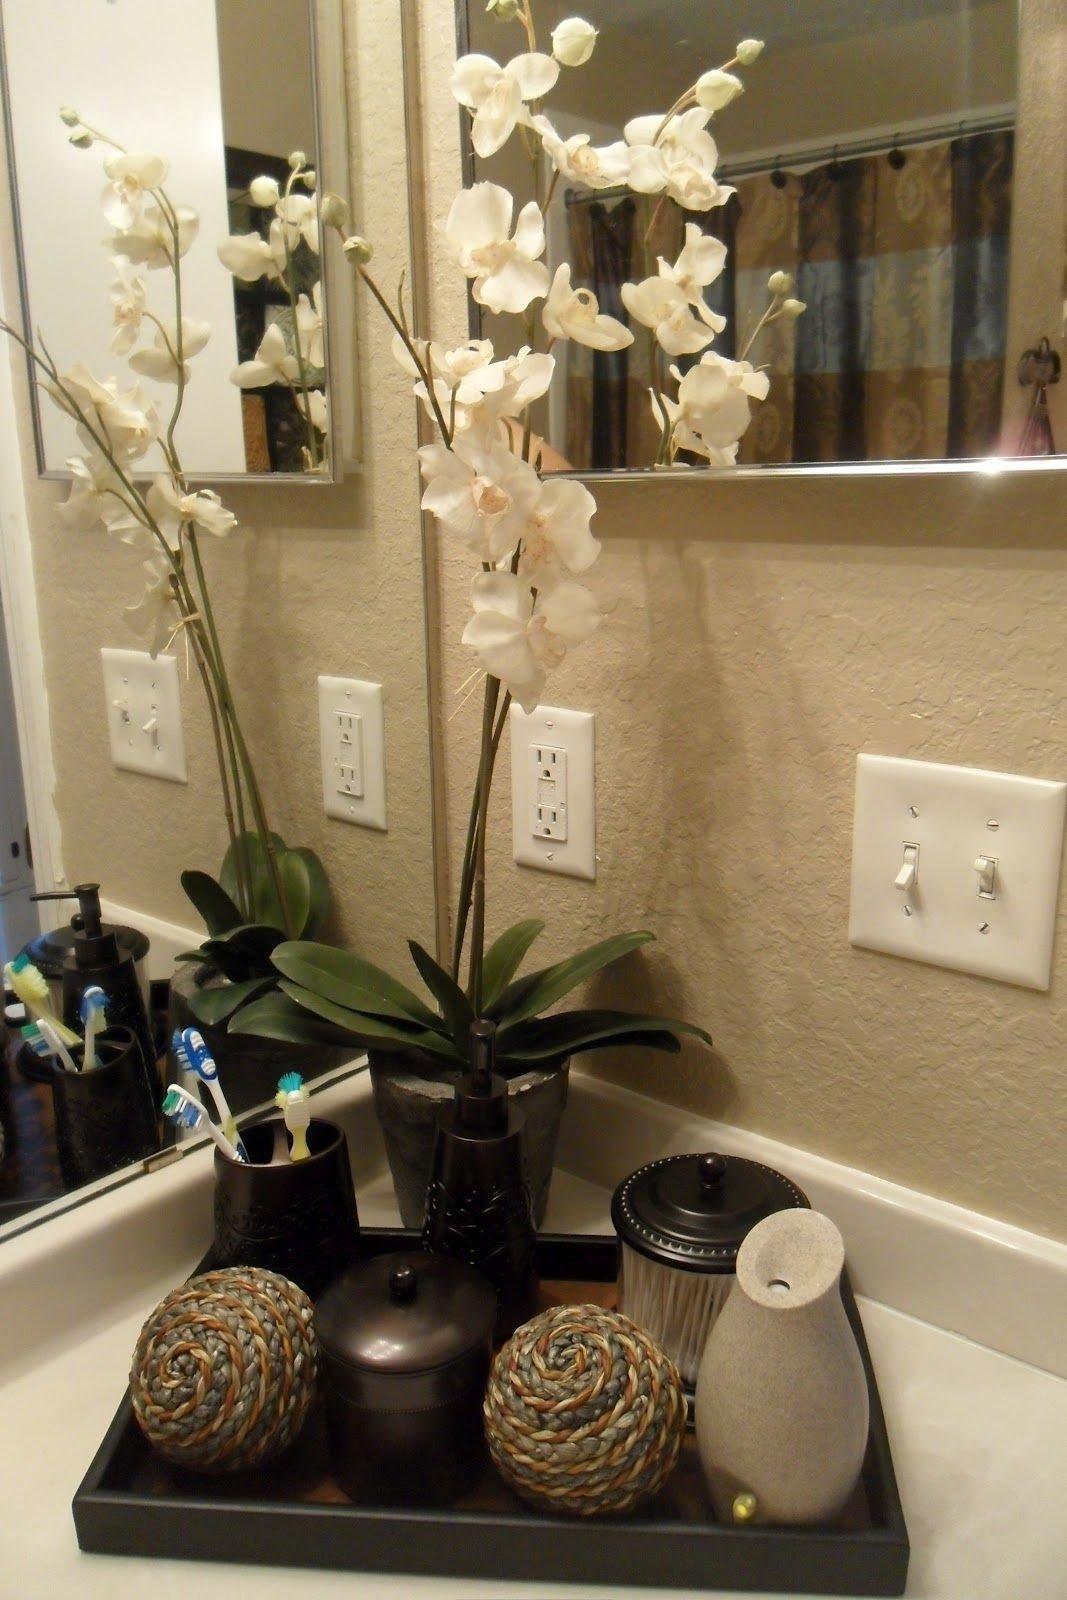 10 Stylish Ideas For Decorating A Bathroom 7 unique bathroom decor ideas guest bath sinks and middle 2020